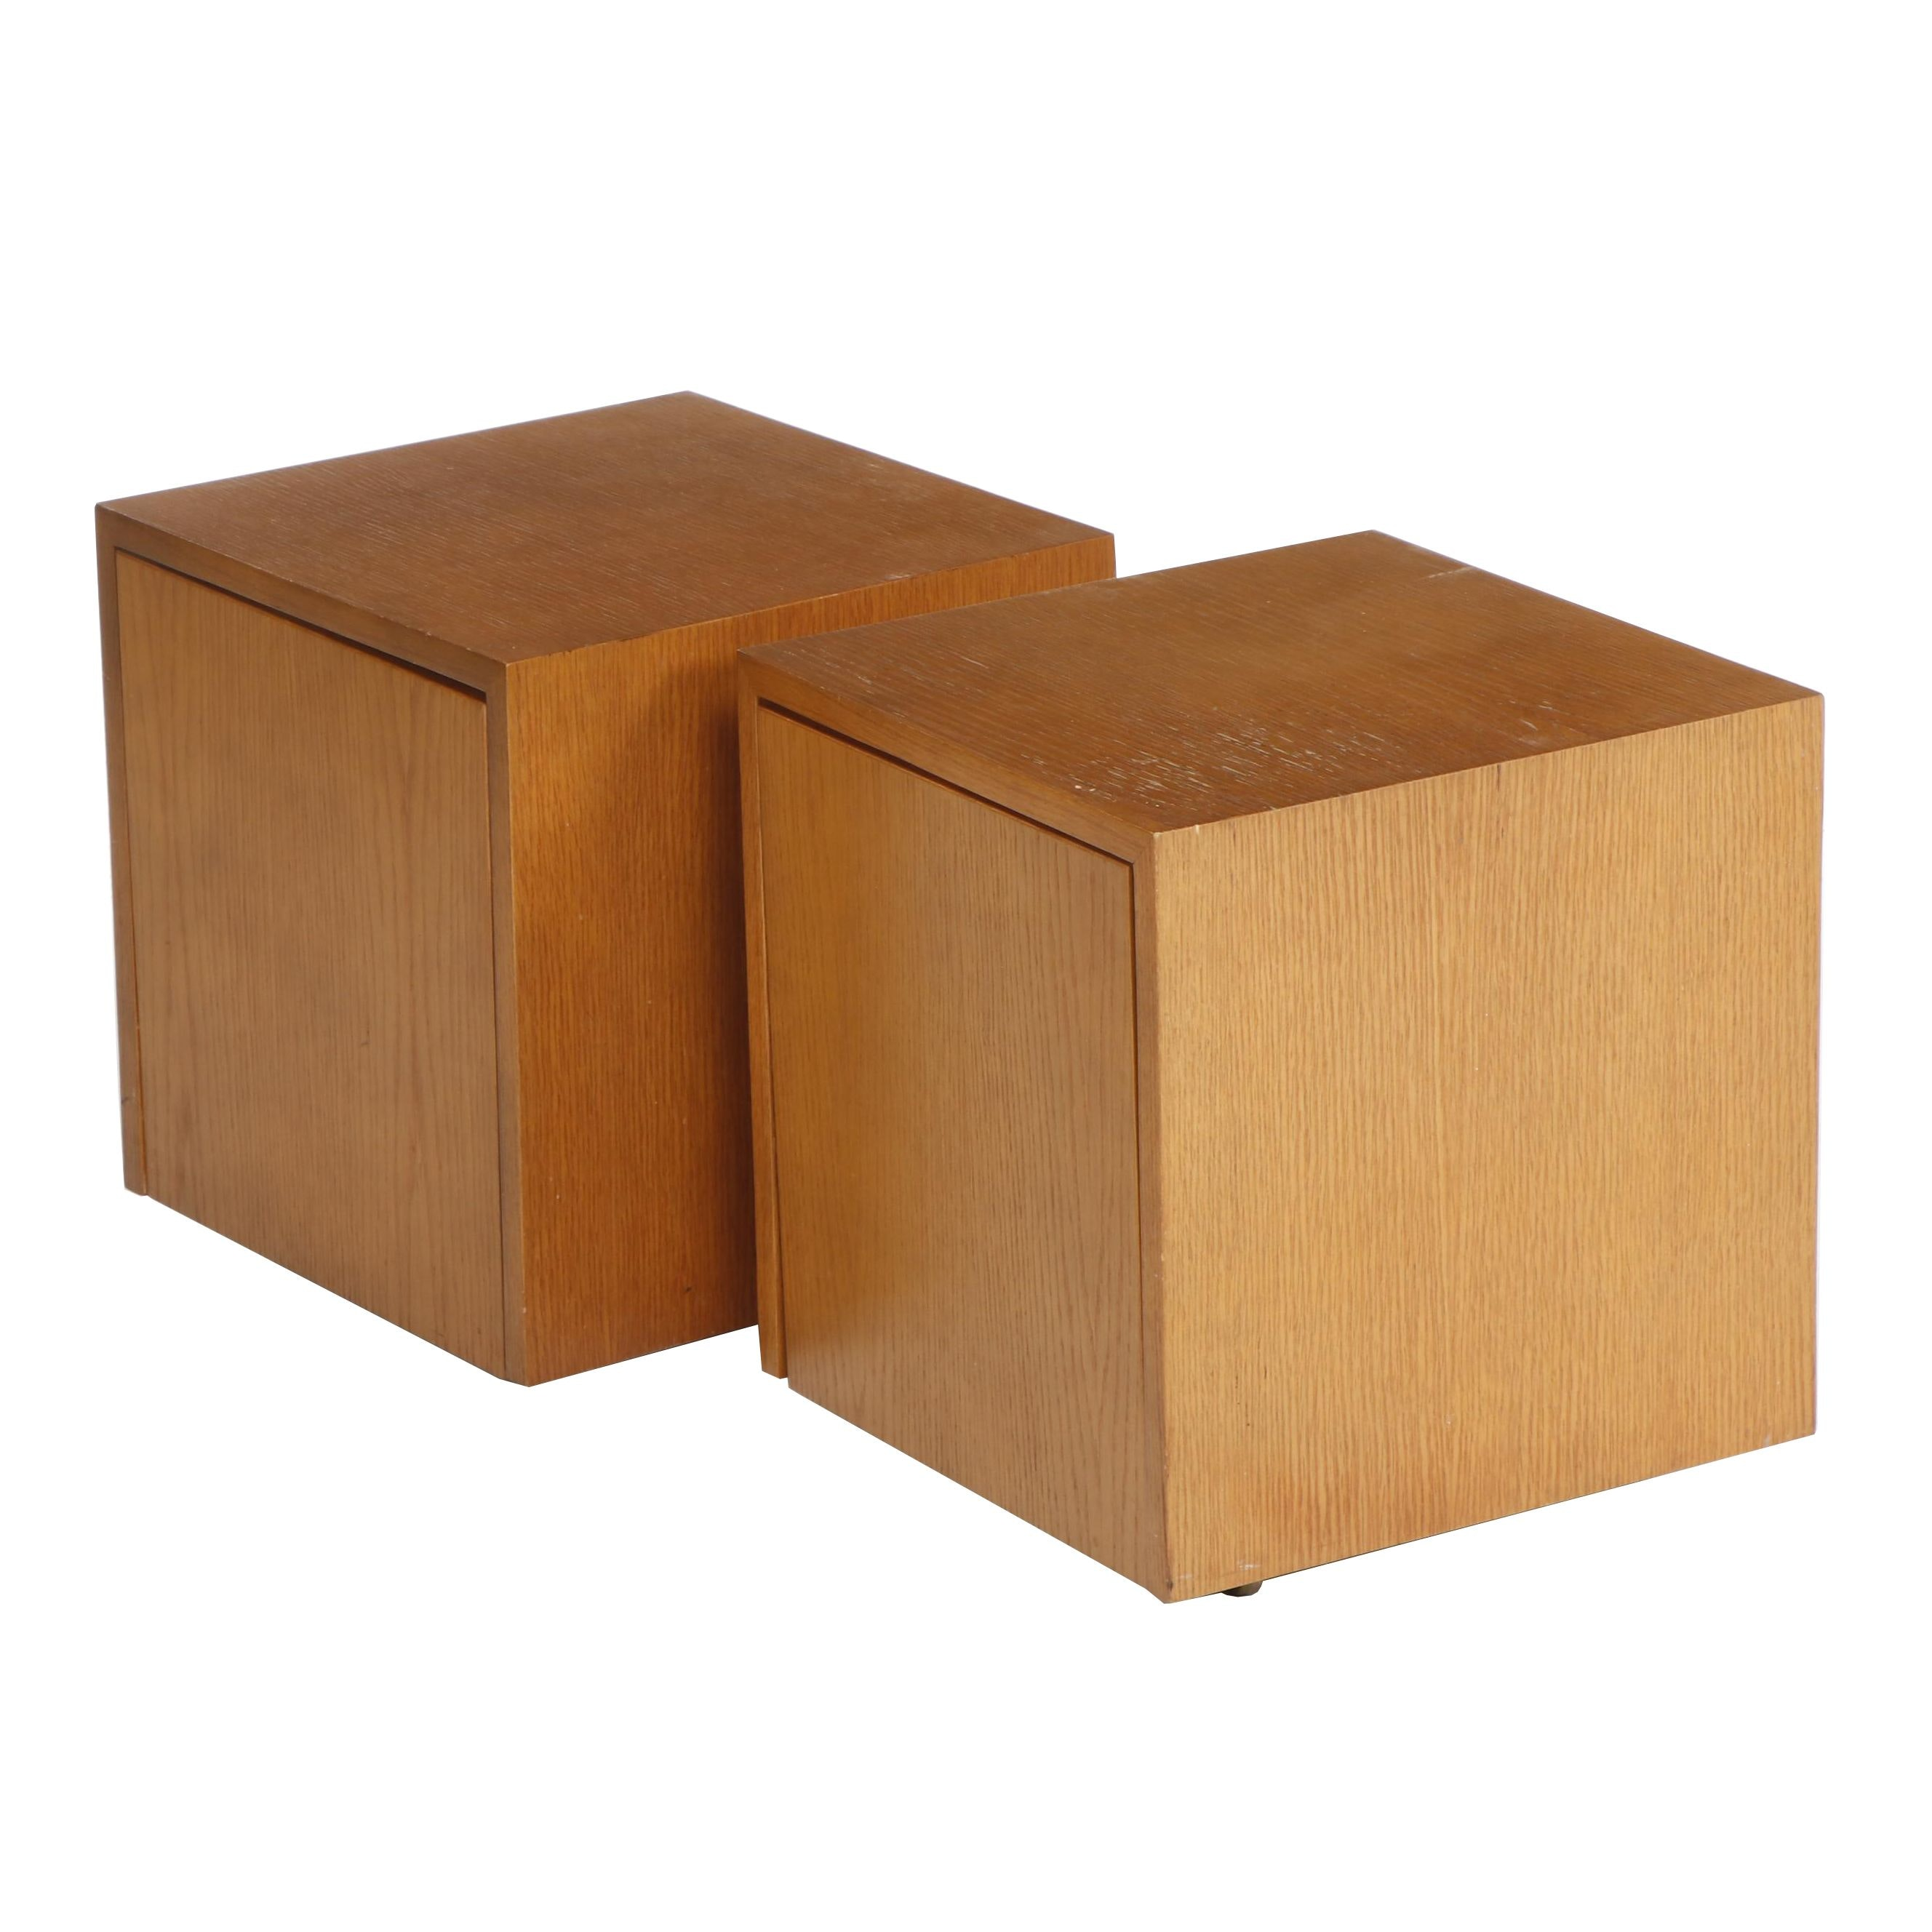 Elm Storage Side Tables on Casters with Adjustable Shelves